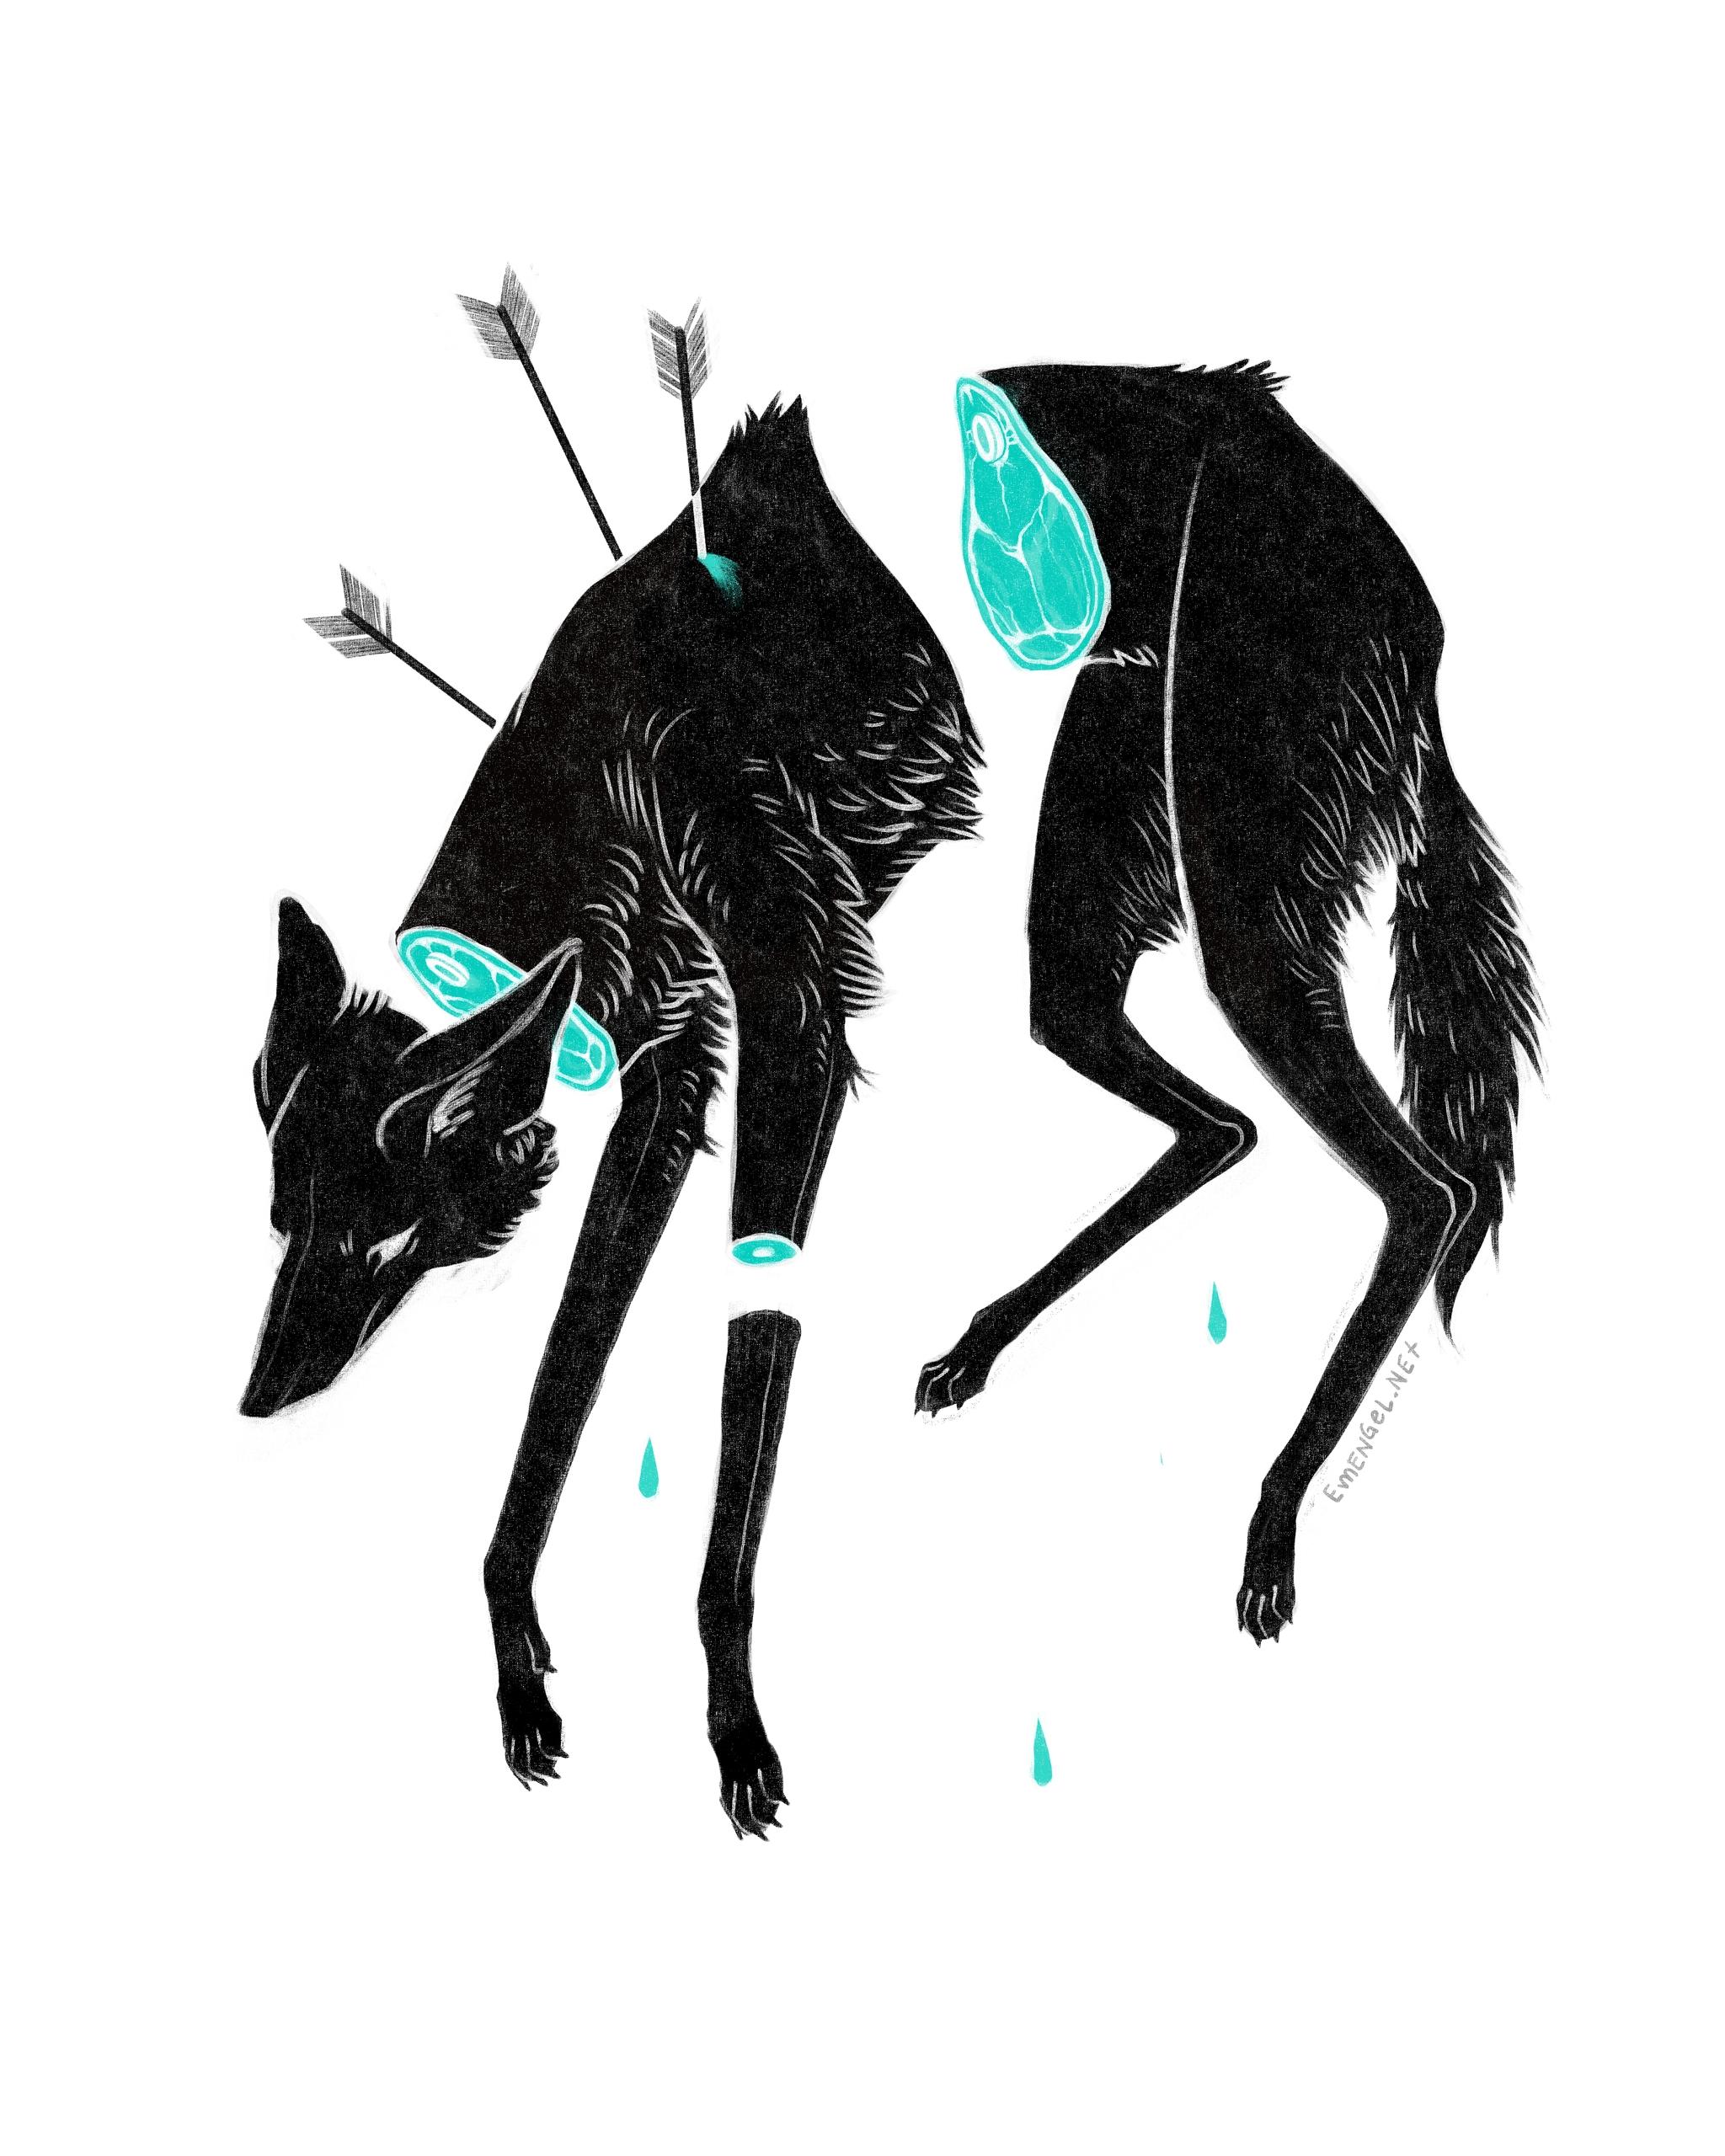 Severed - wolf, manedwolf, arrows - emengel | ello